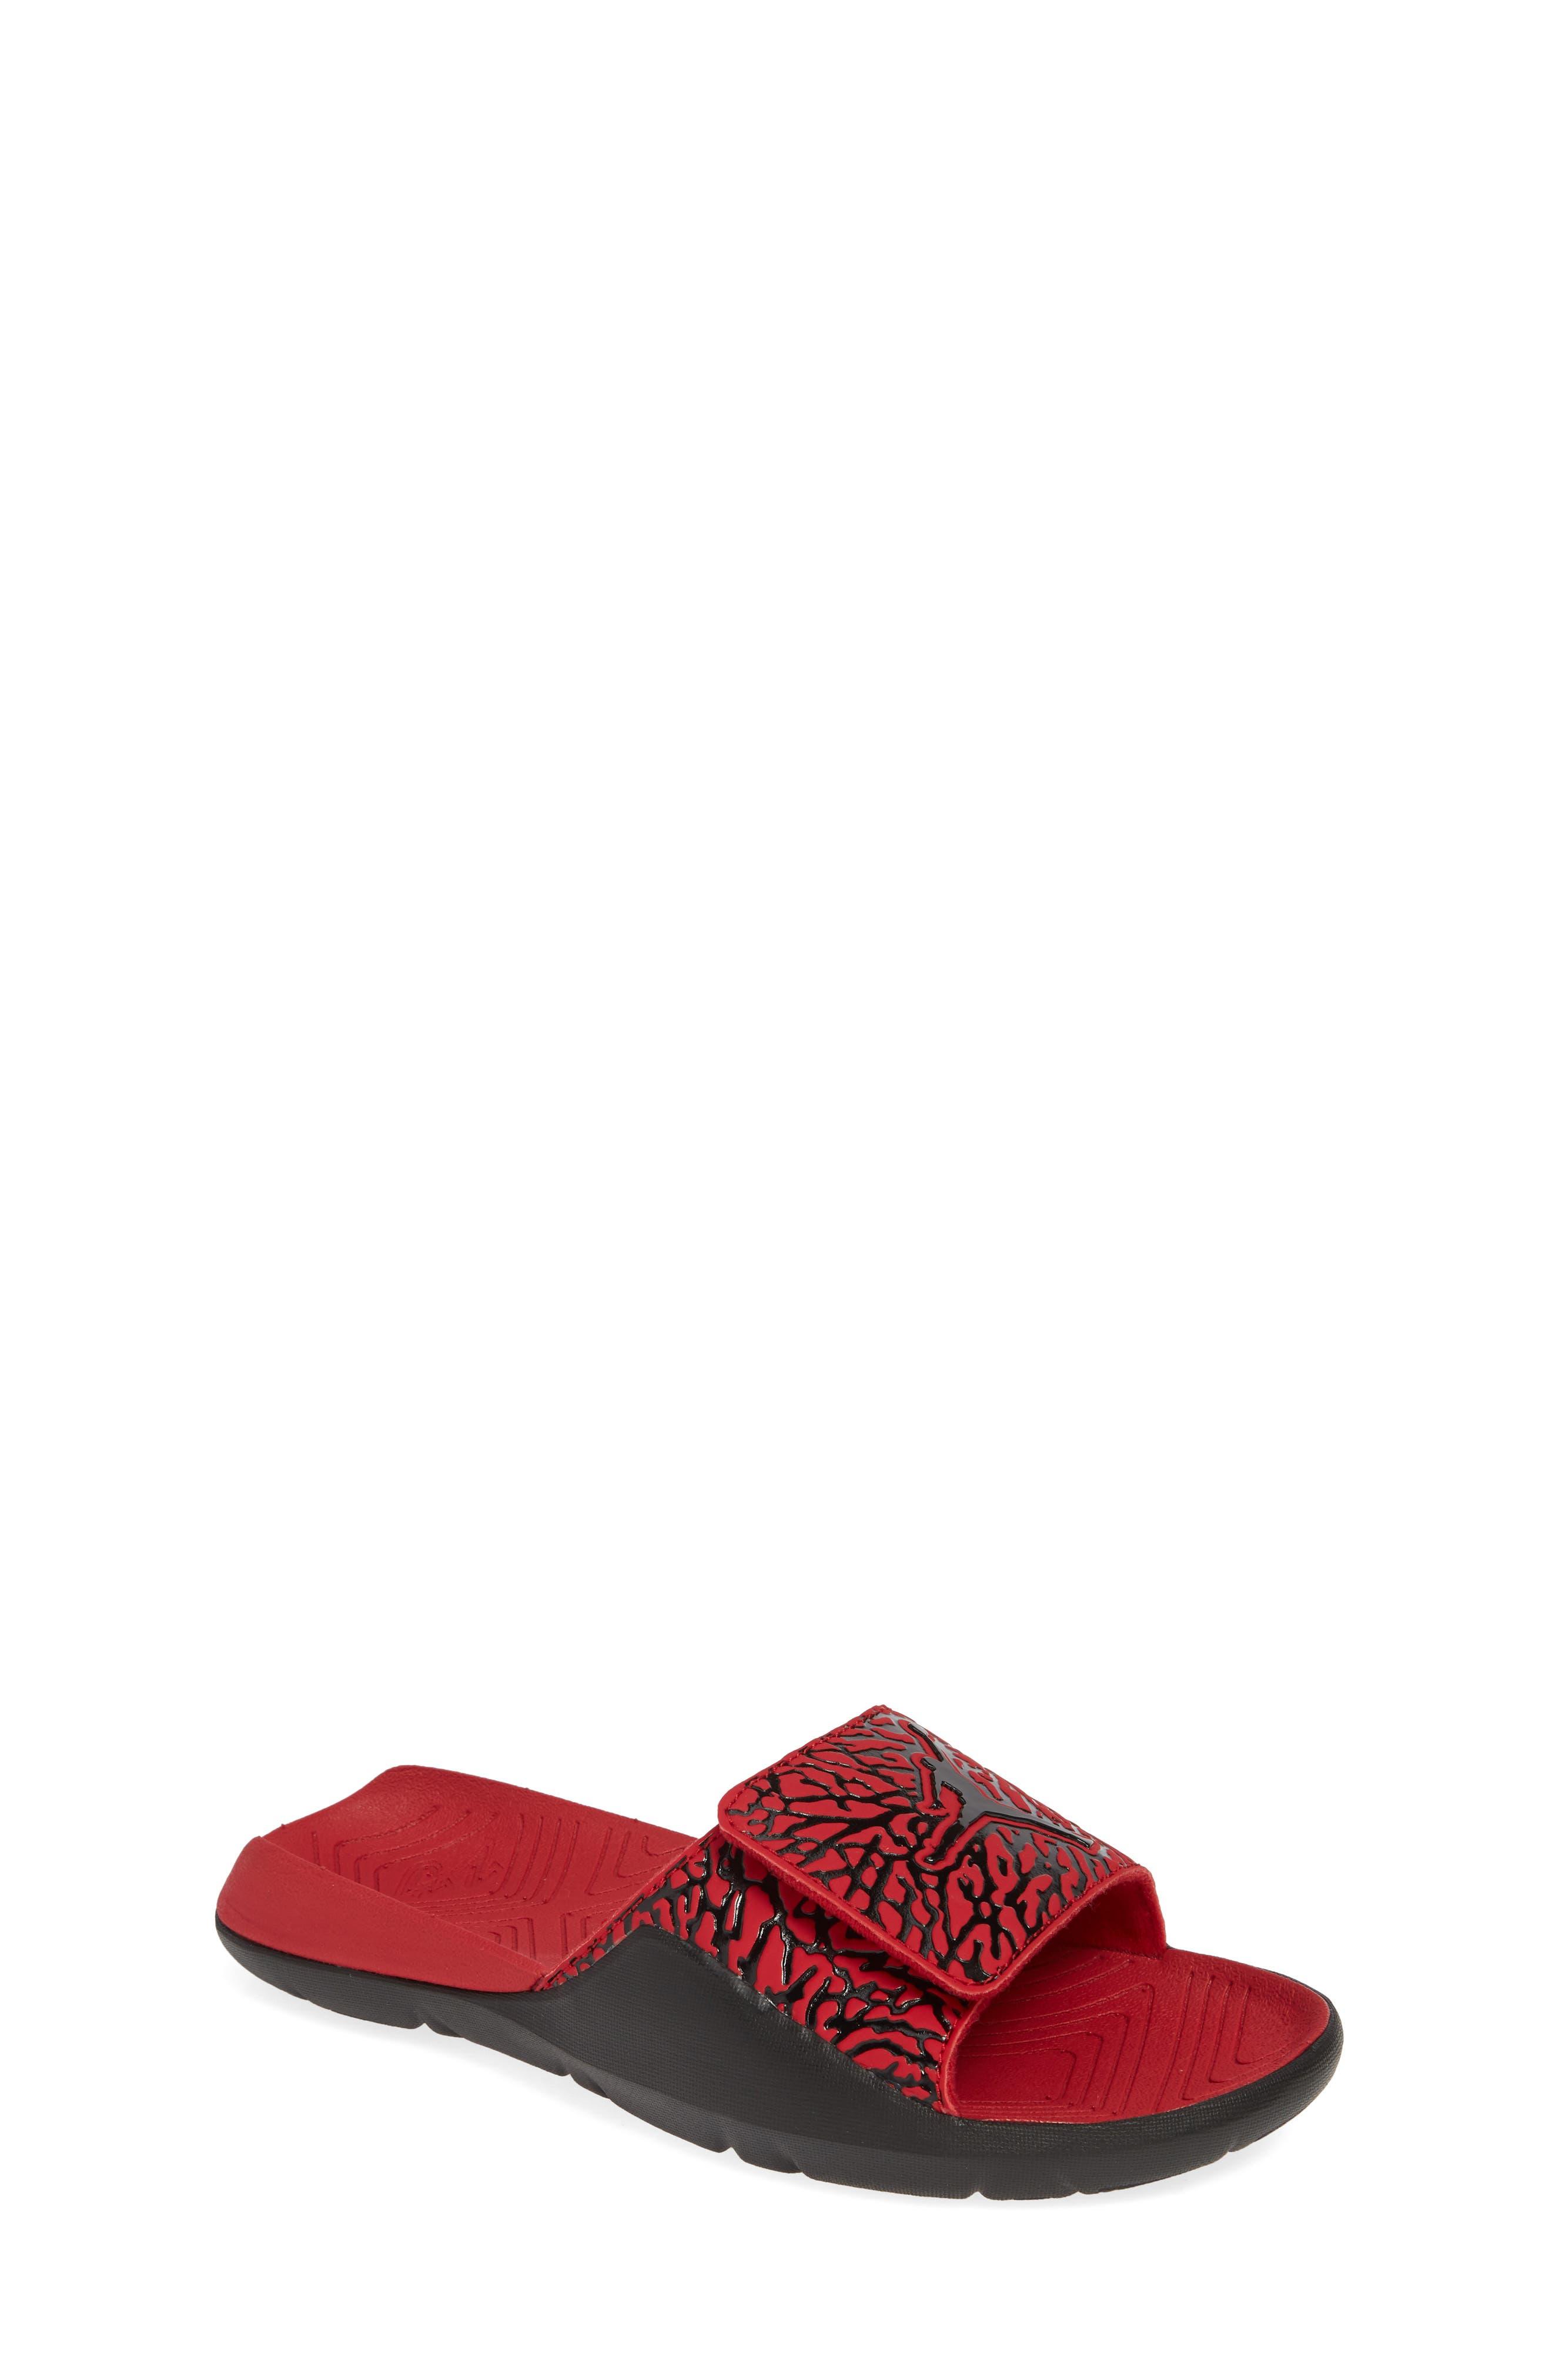 JORDAN Hydro 7 V2 Sandal, Main, color, GYM RED/ BLACK